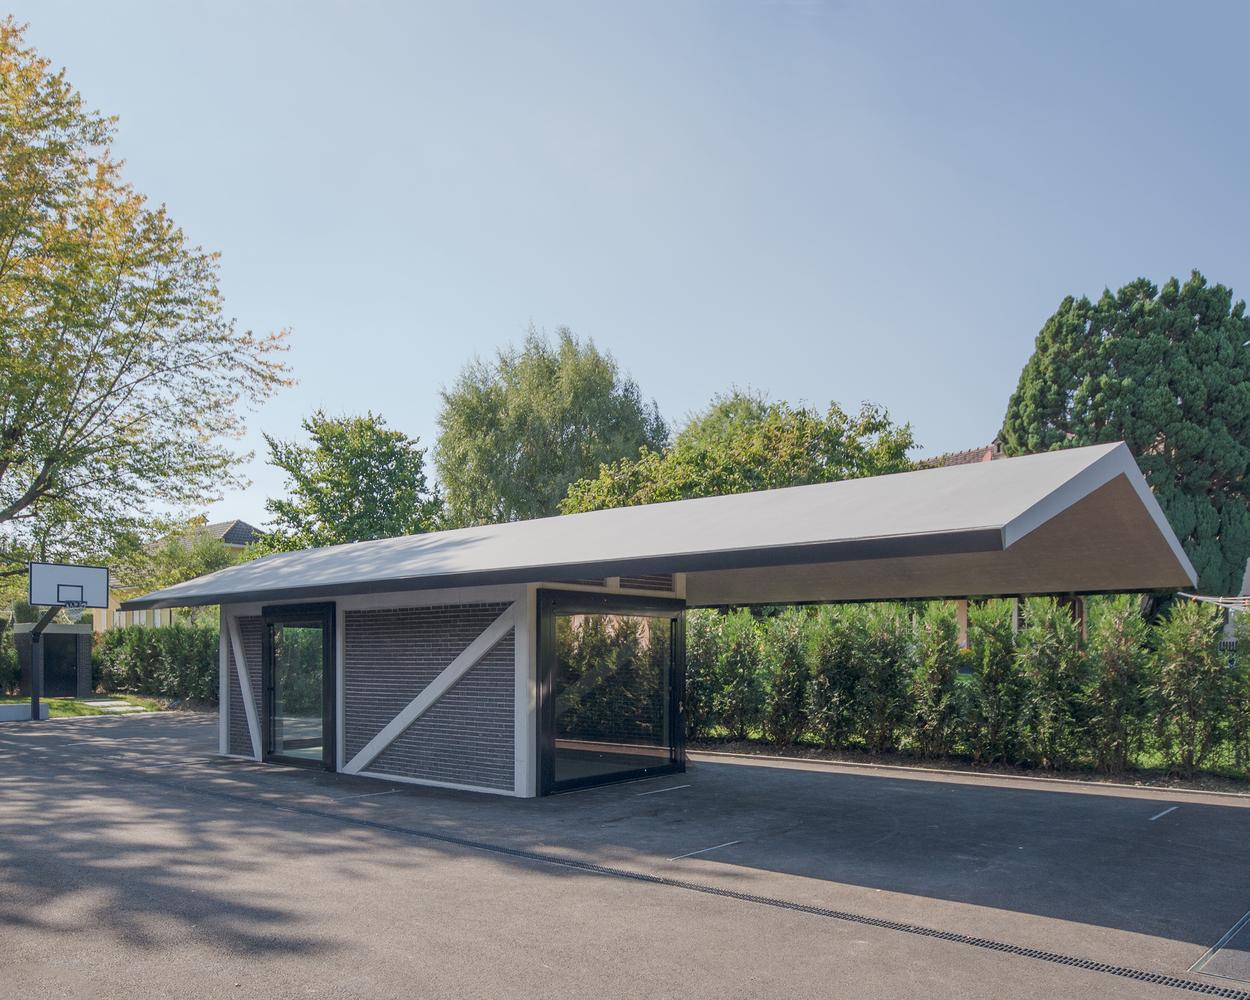 Дизайн гаража с навесом - фото 2